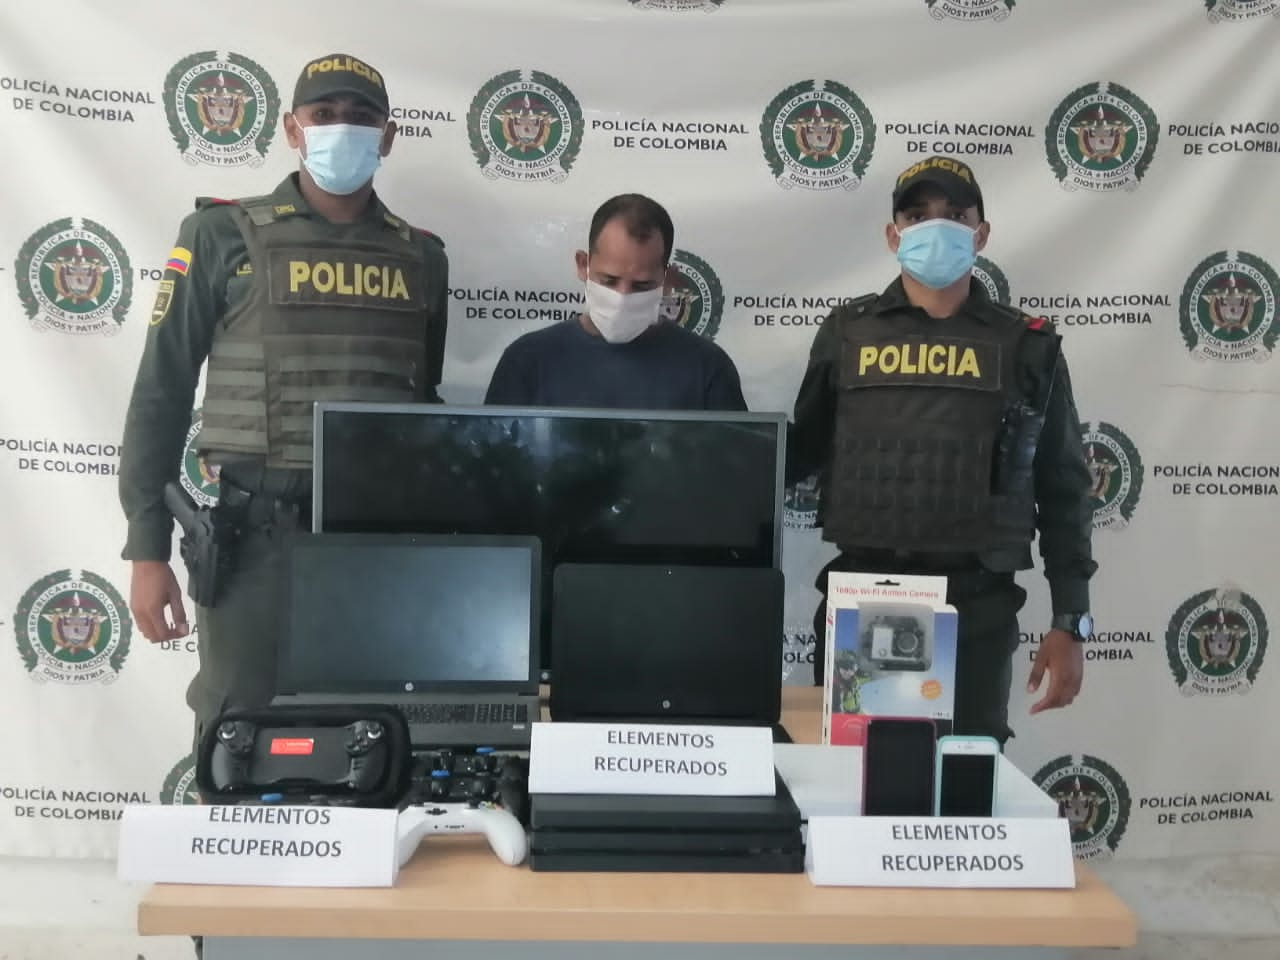 hoyennoticia.com, Millonario robo recupero la Policía en Riohacha